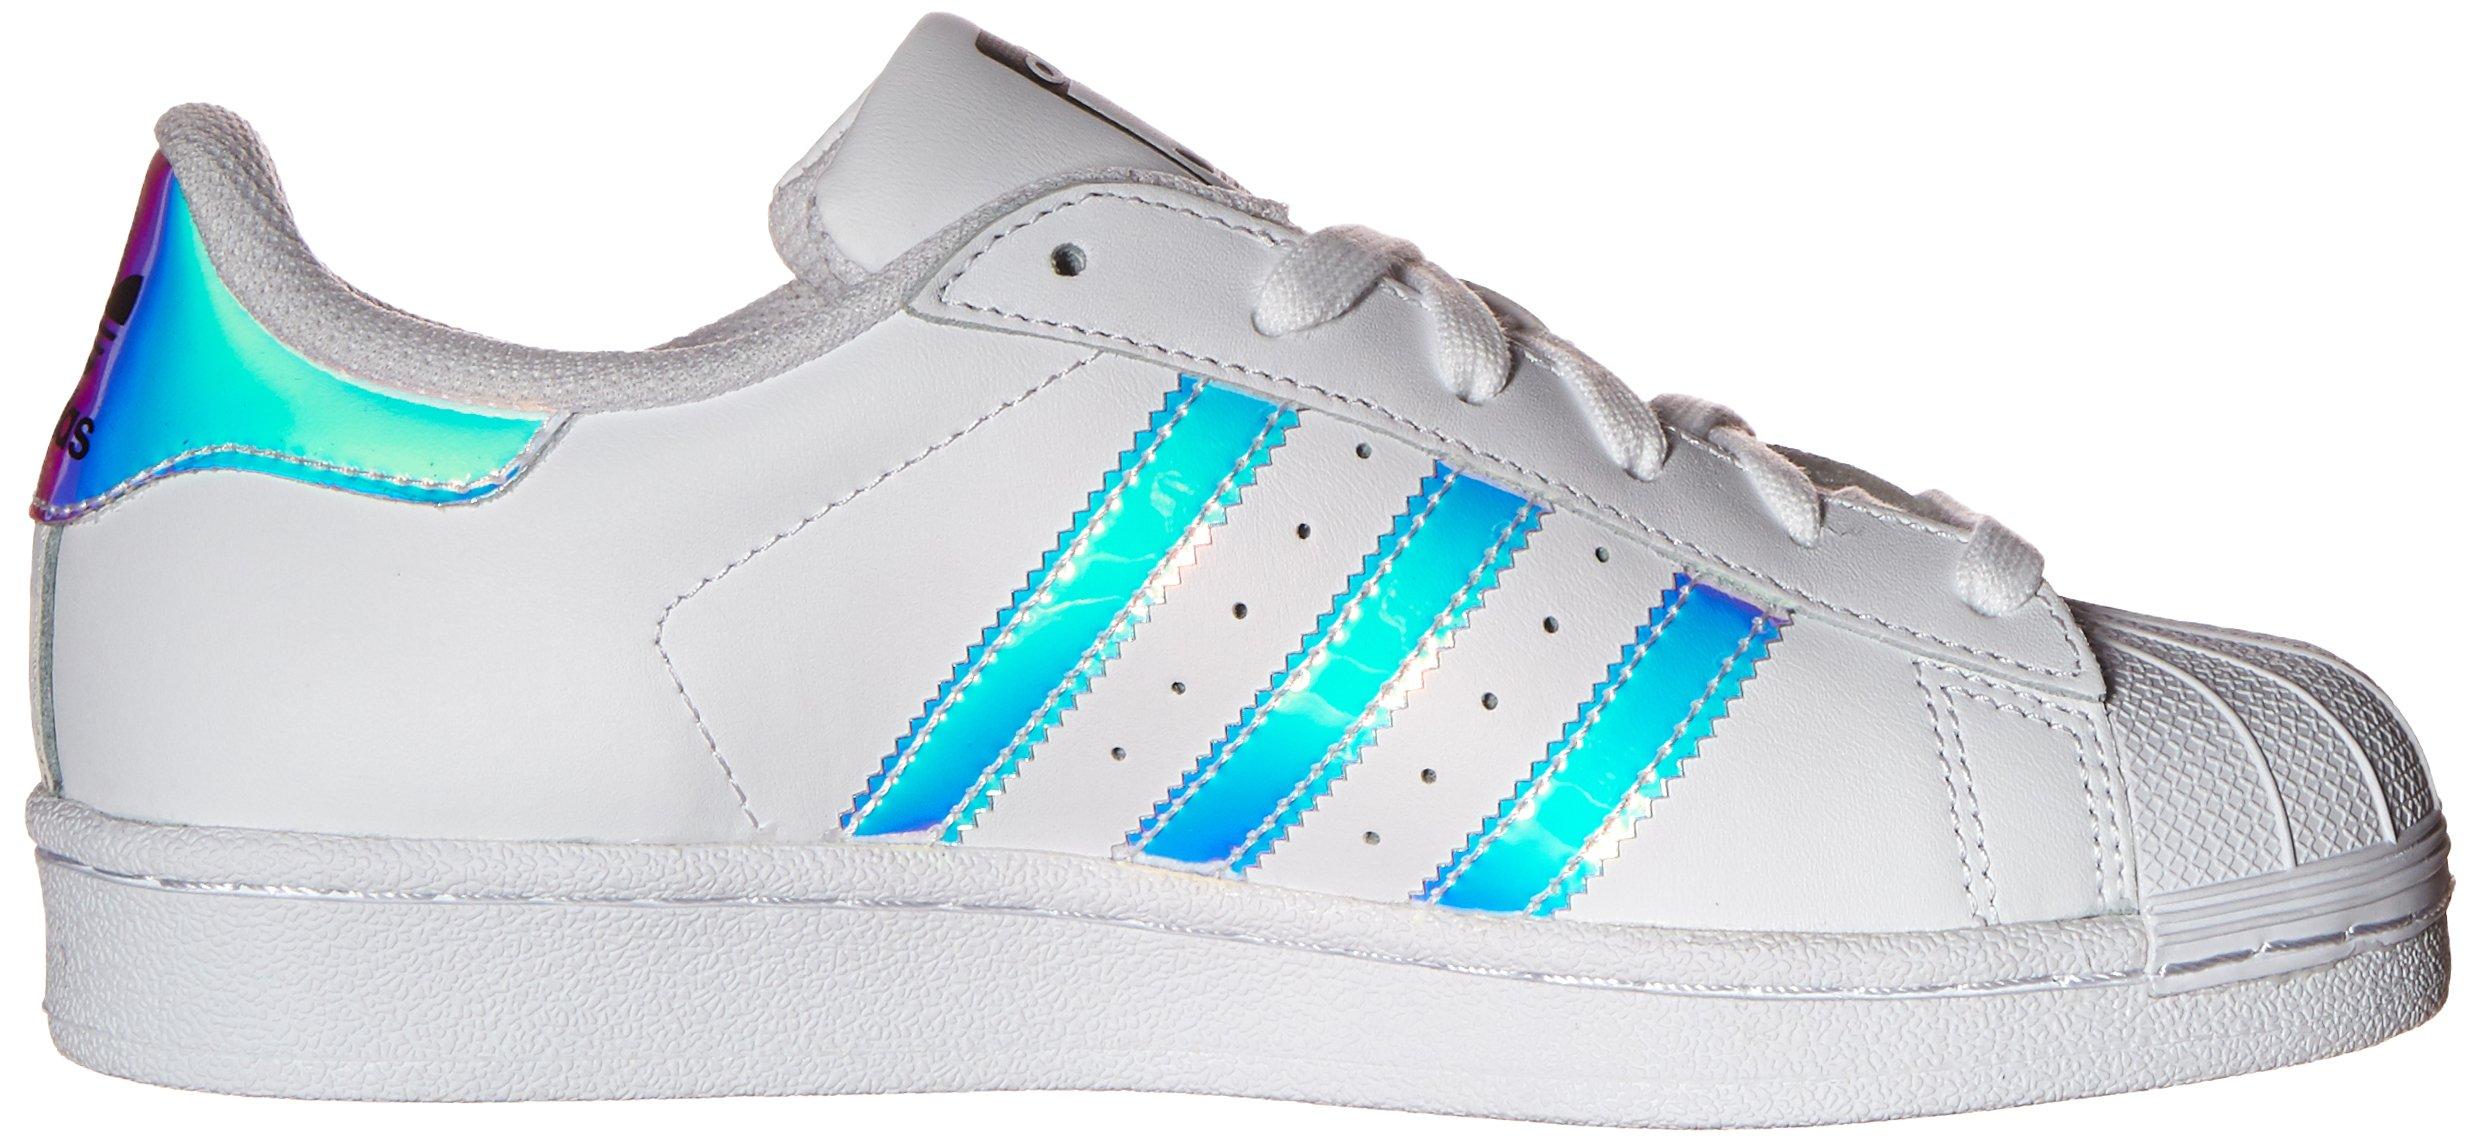 adidas Originals Kid's Superstar J Shoe, White/White/Metallic Silver, 4 M US Big Kid by adidas Originals (Image #7)